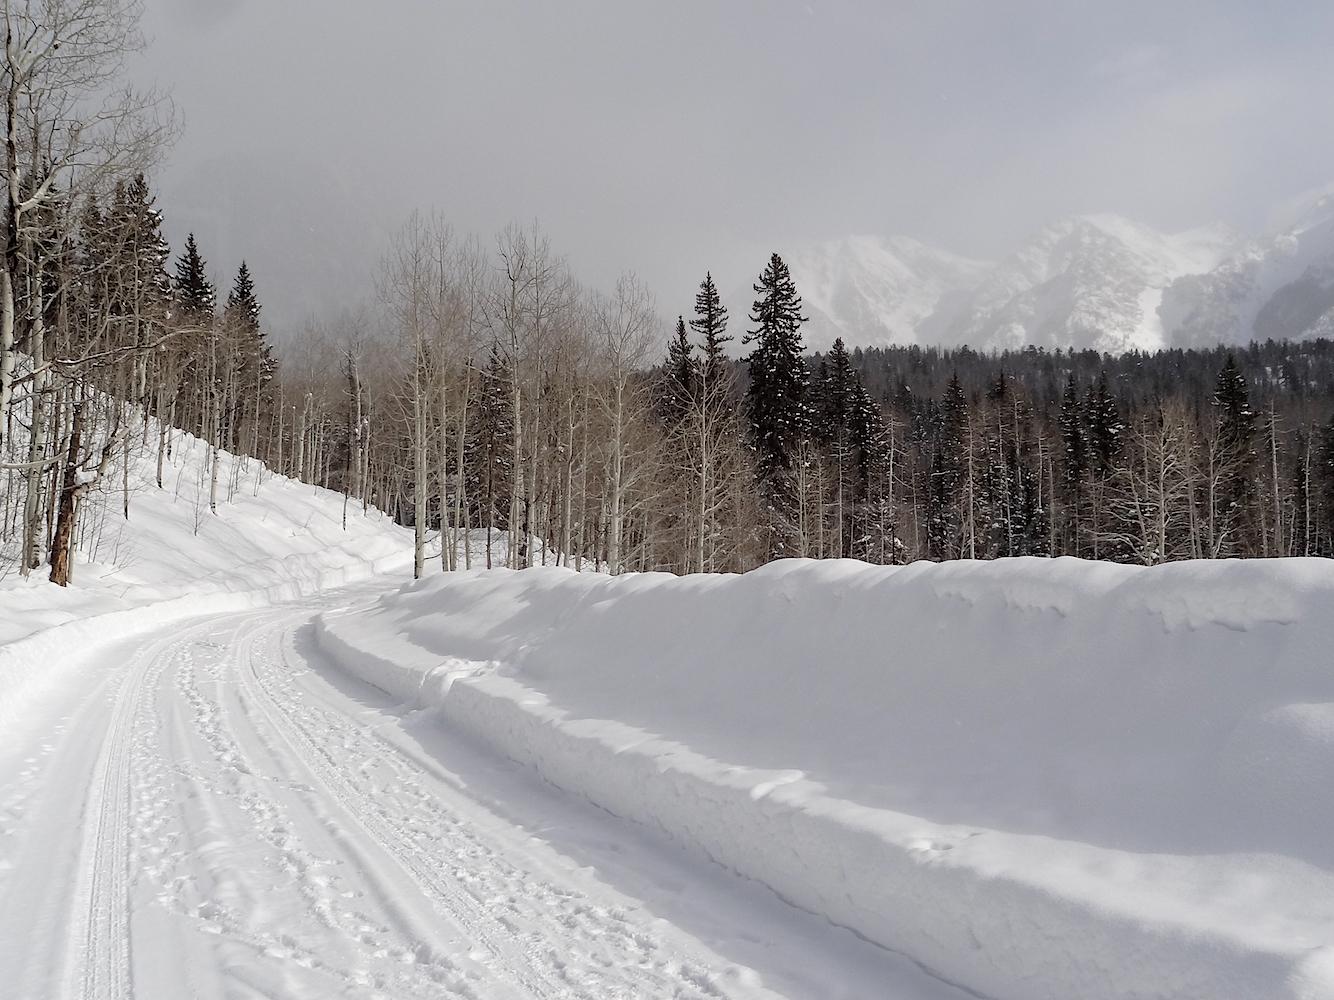 Lime Creek Road Snowshoe, Image #5204